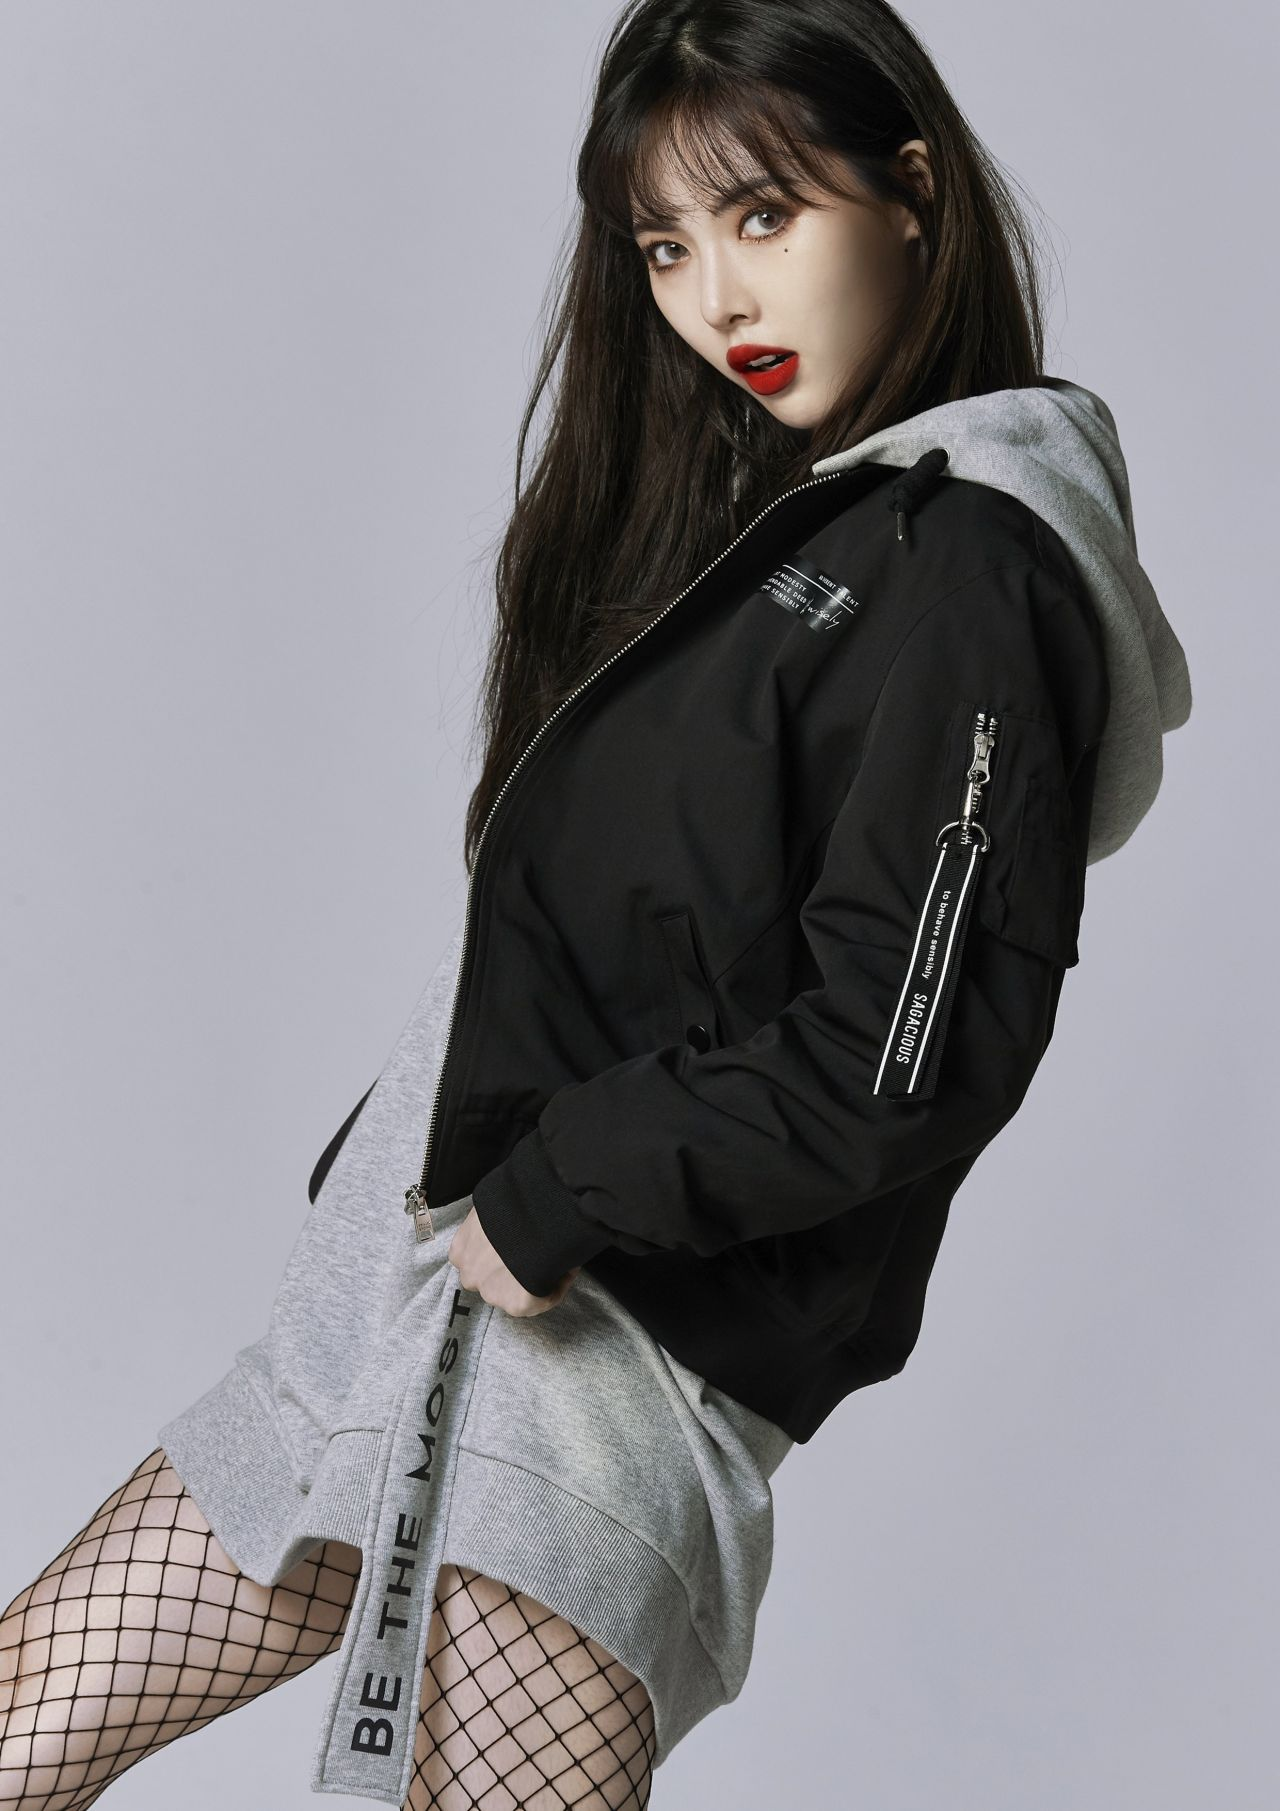 HyunA - Photoshoot for CLRIDE.n (2018)Hyuna 2019 Pics